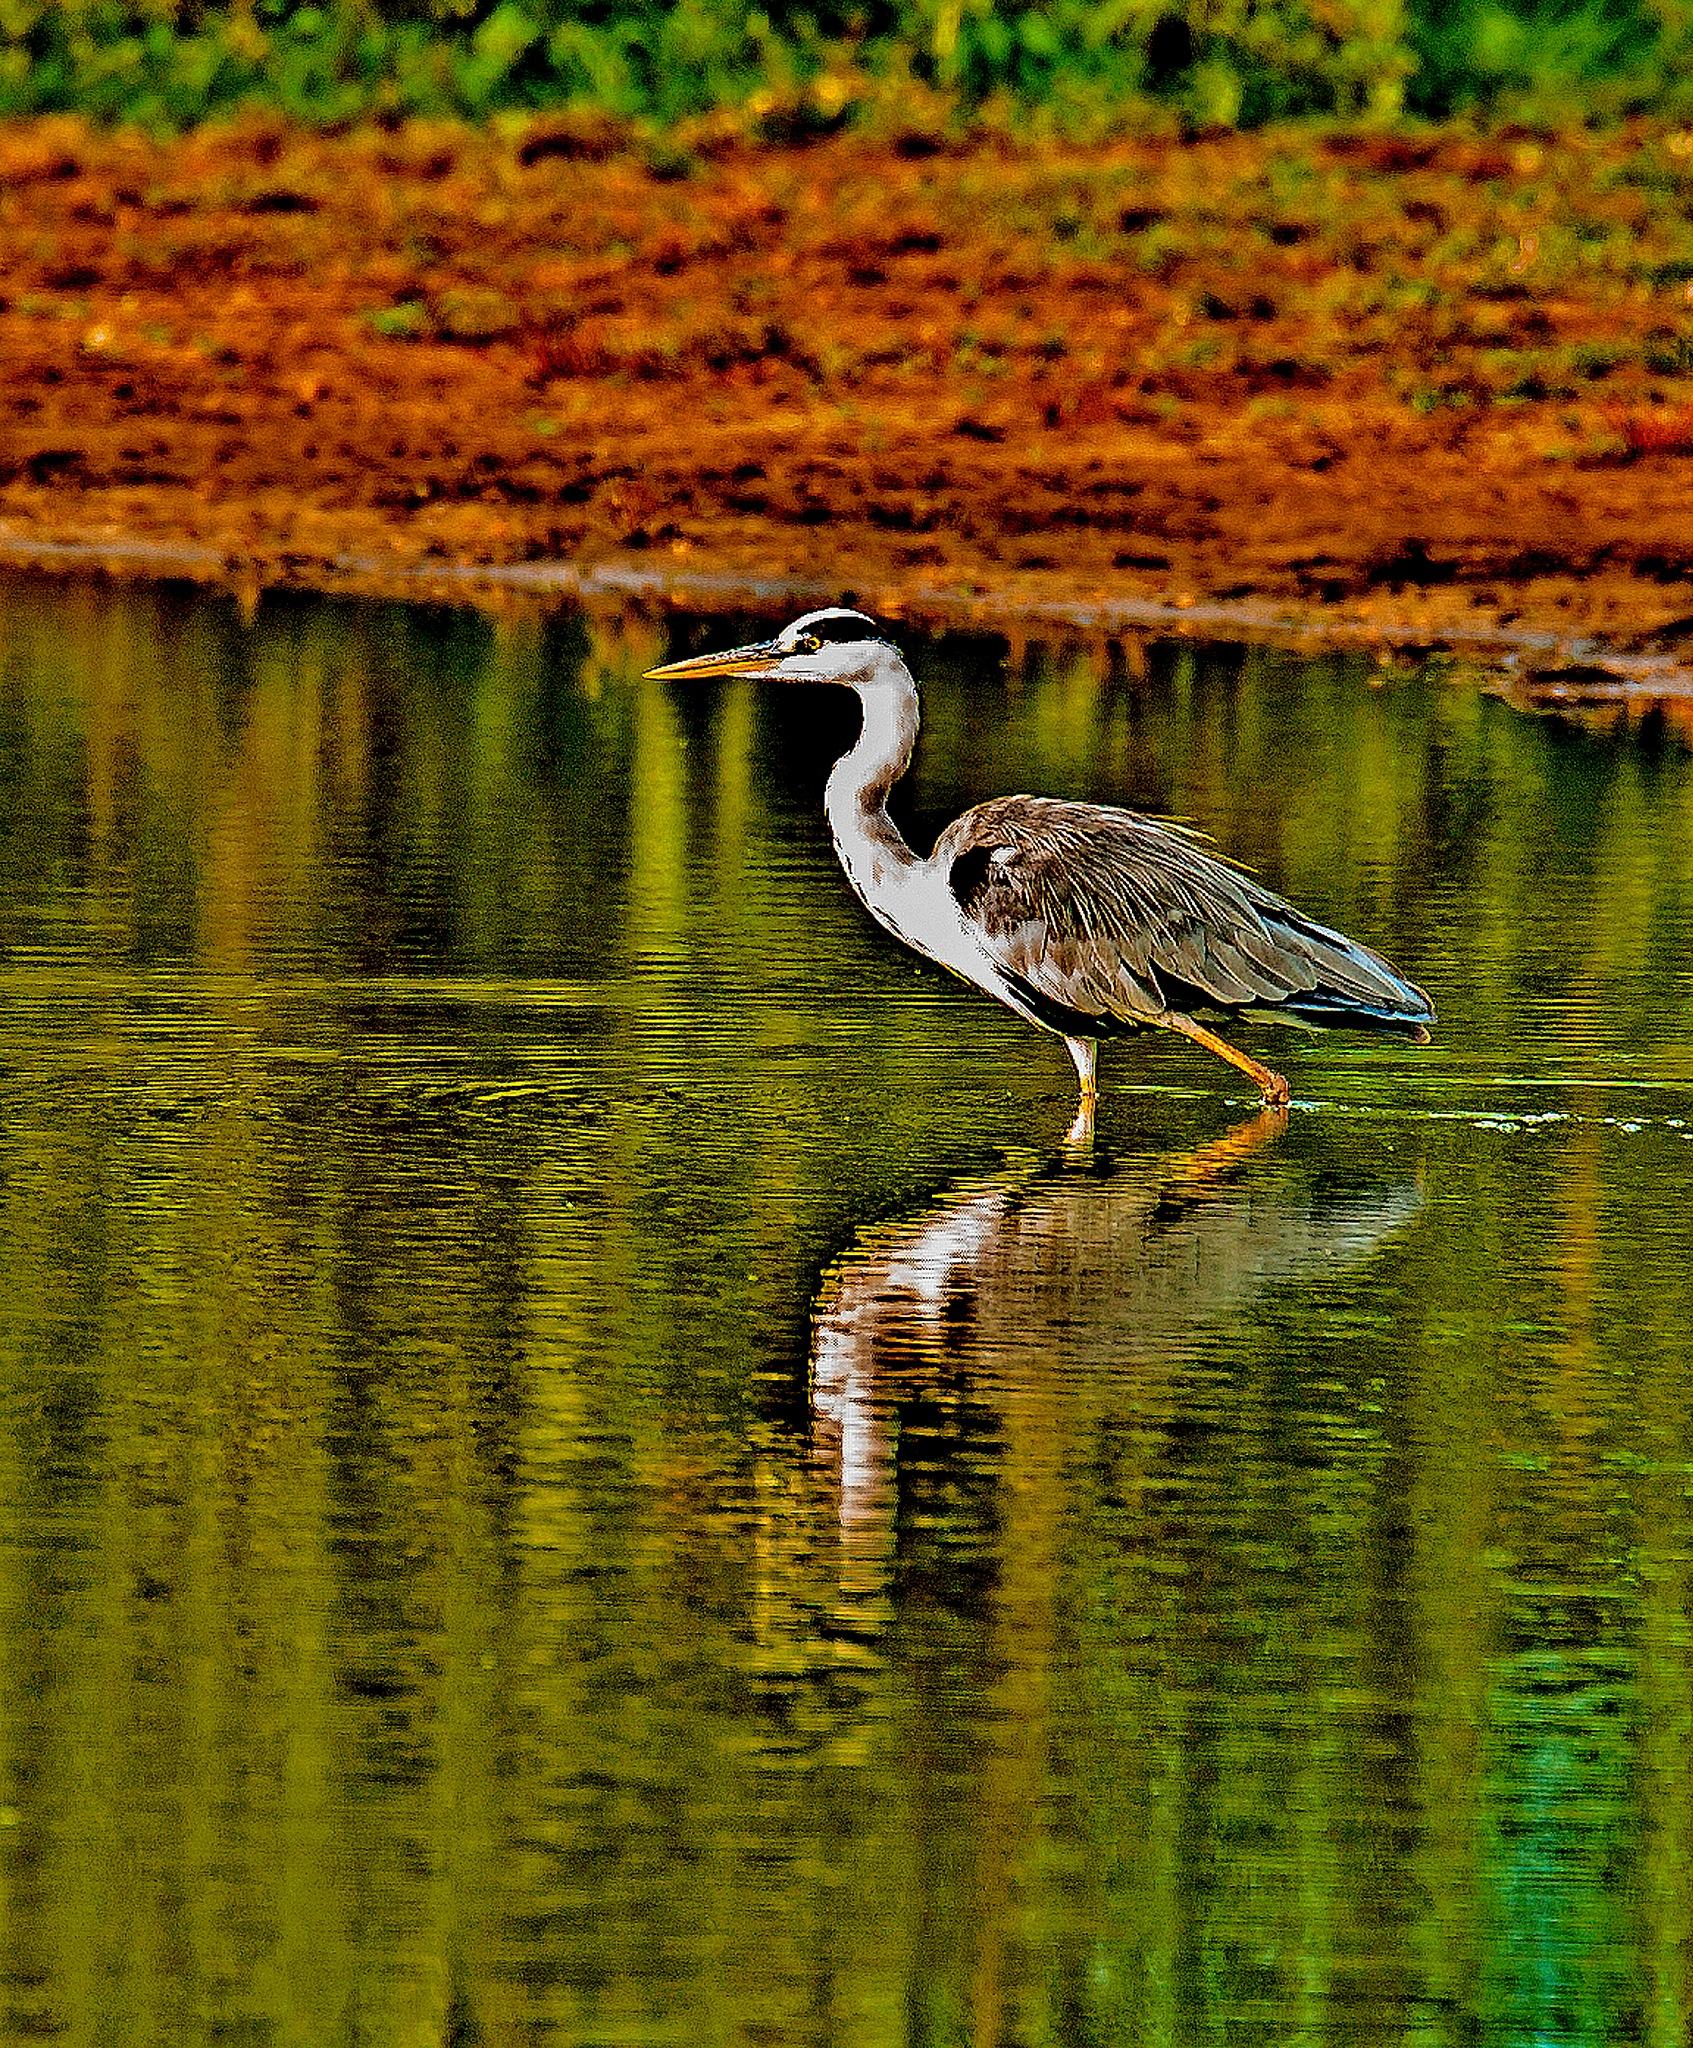 Heron by PeterMChambers